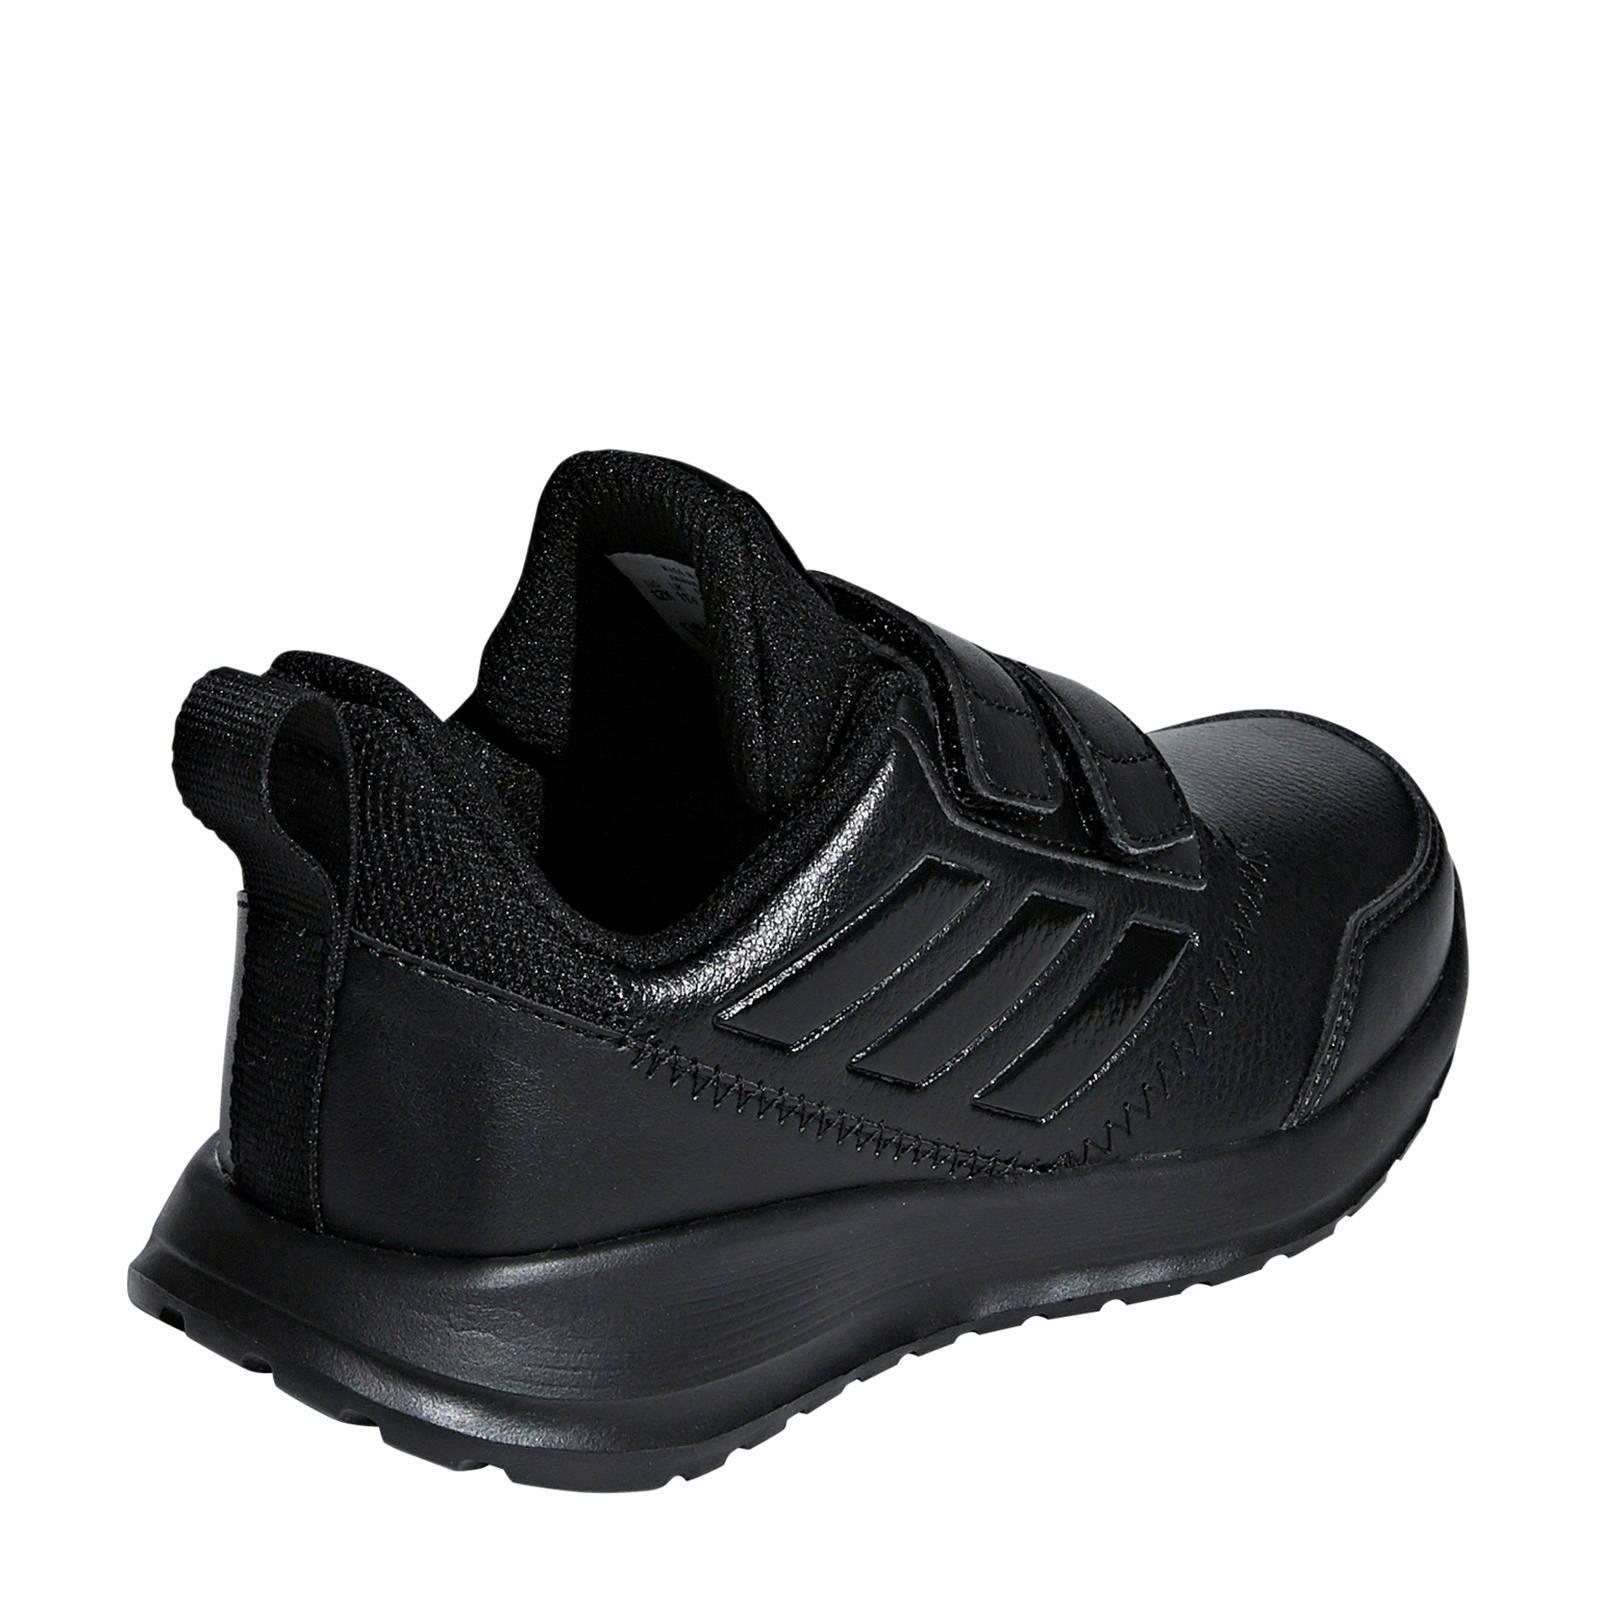 AltaRun CF K sportschoenen zwart kids